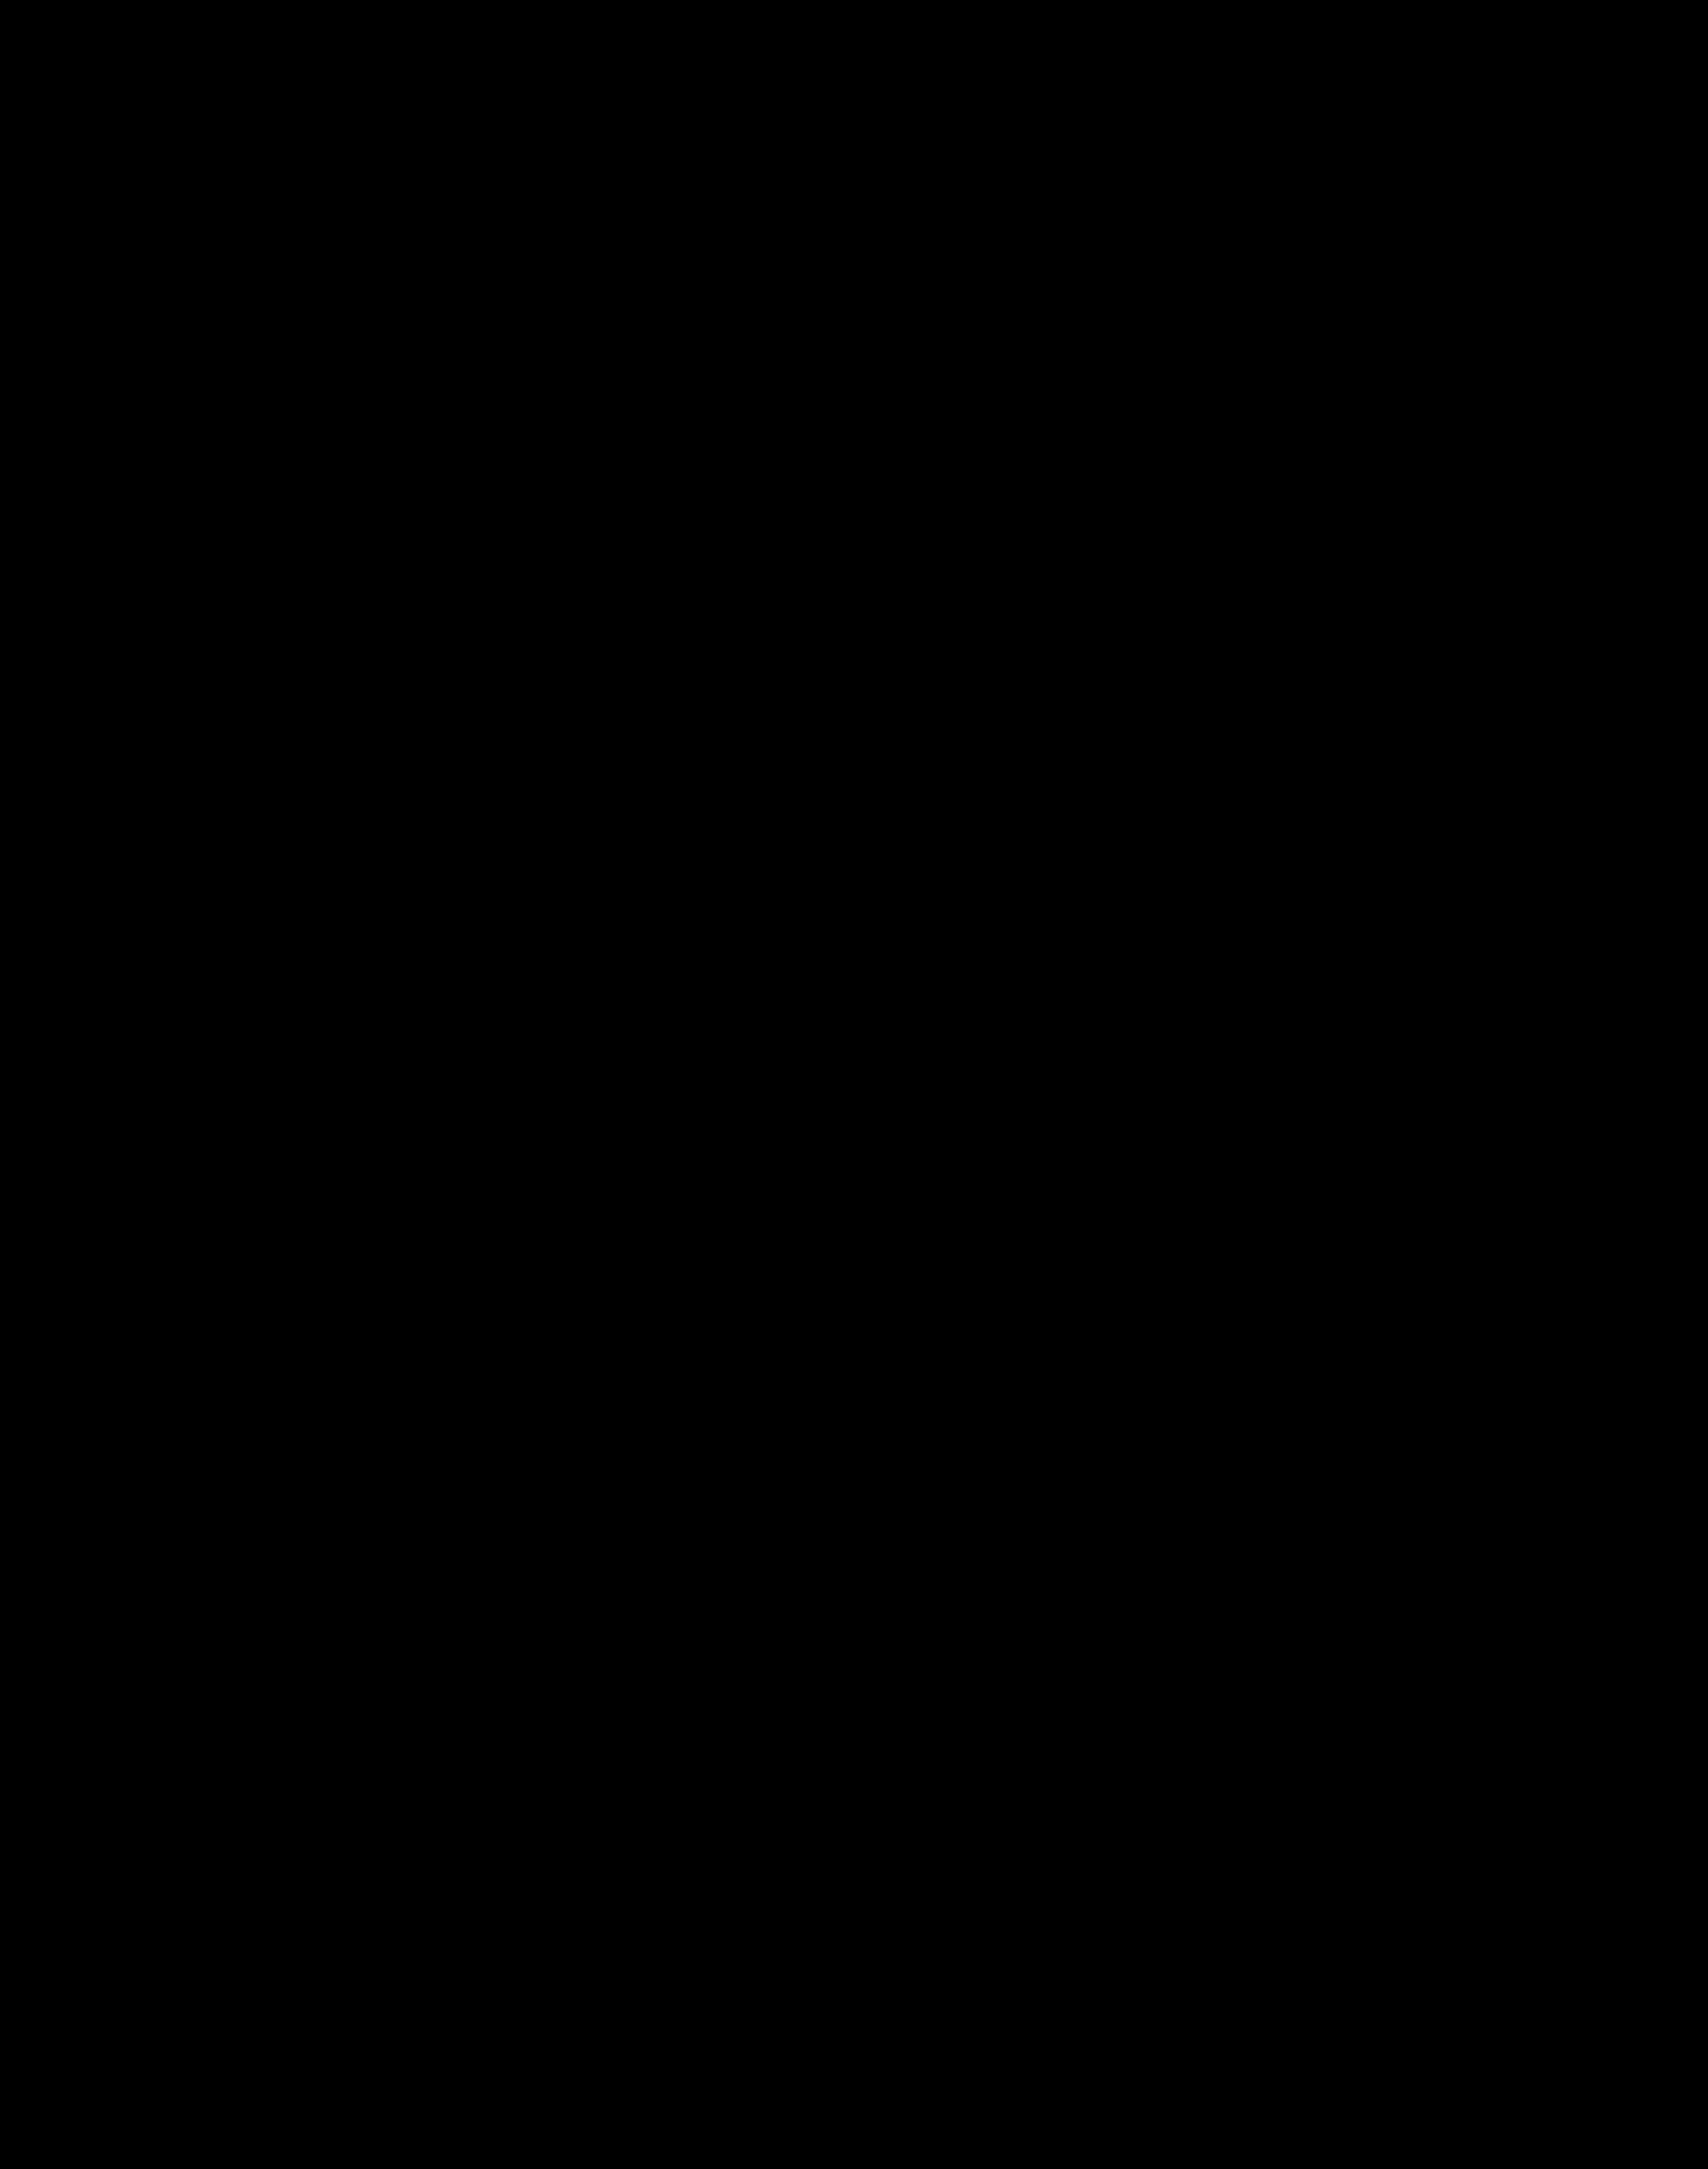 marijuana clipart silhouette